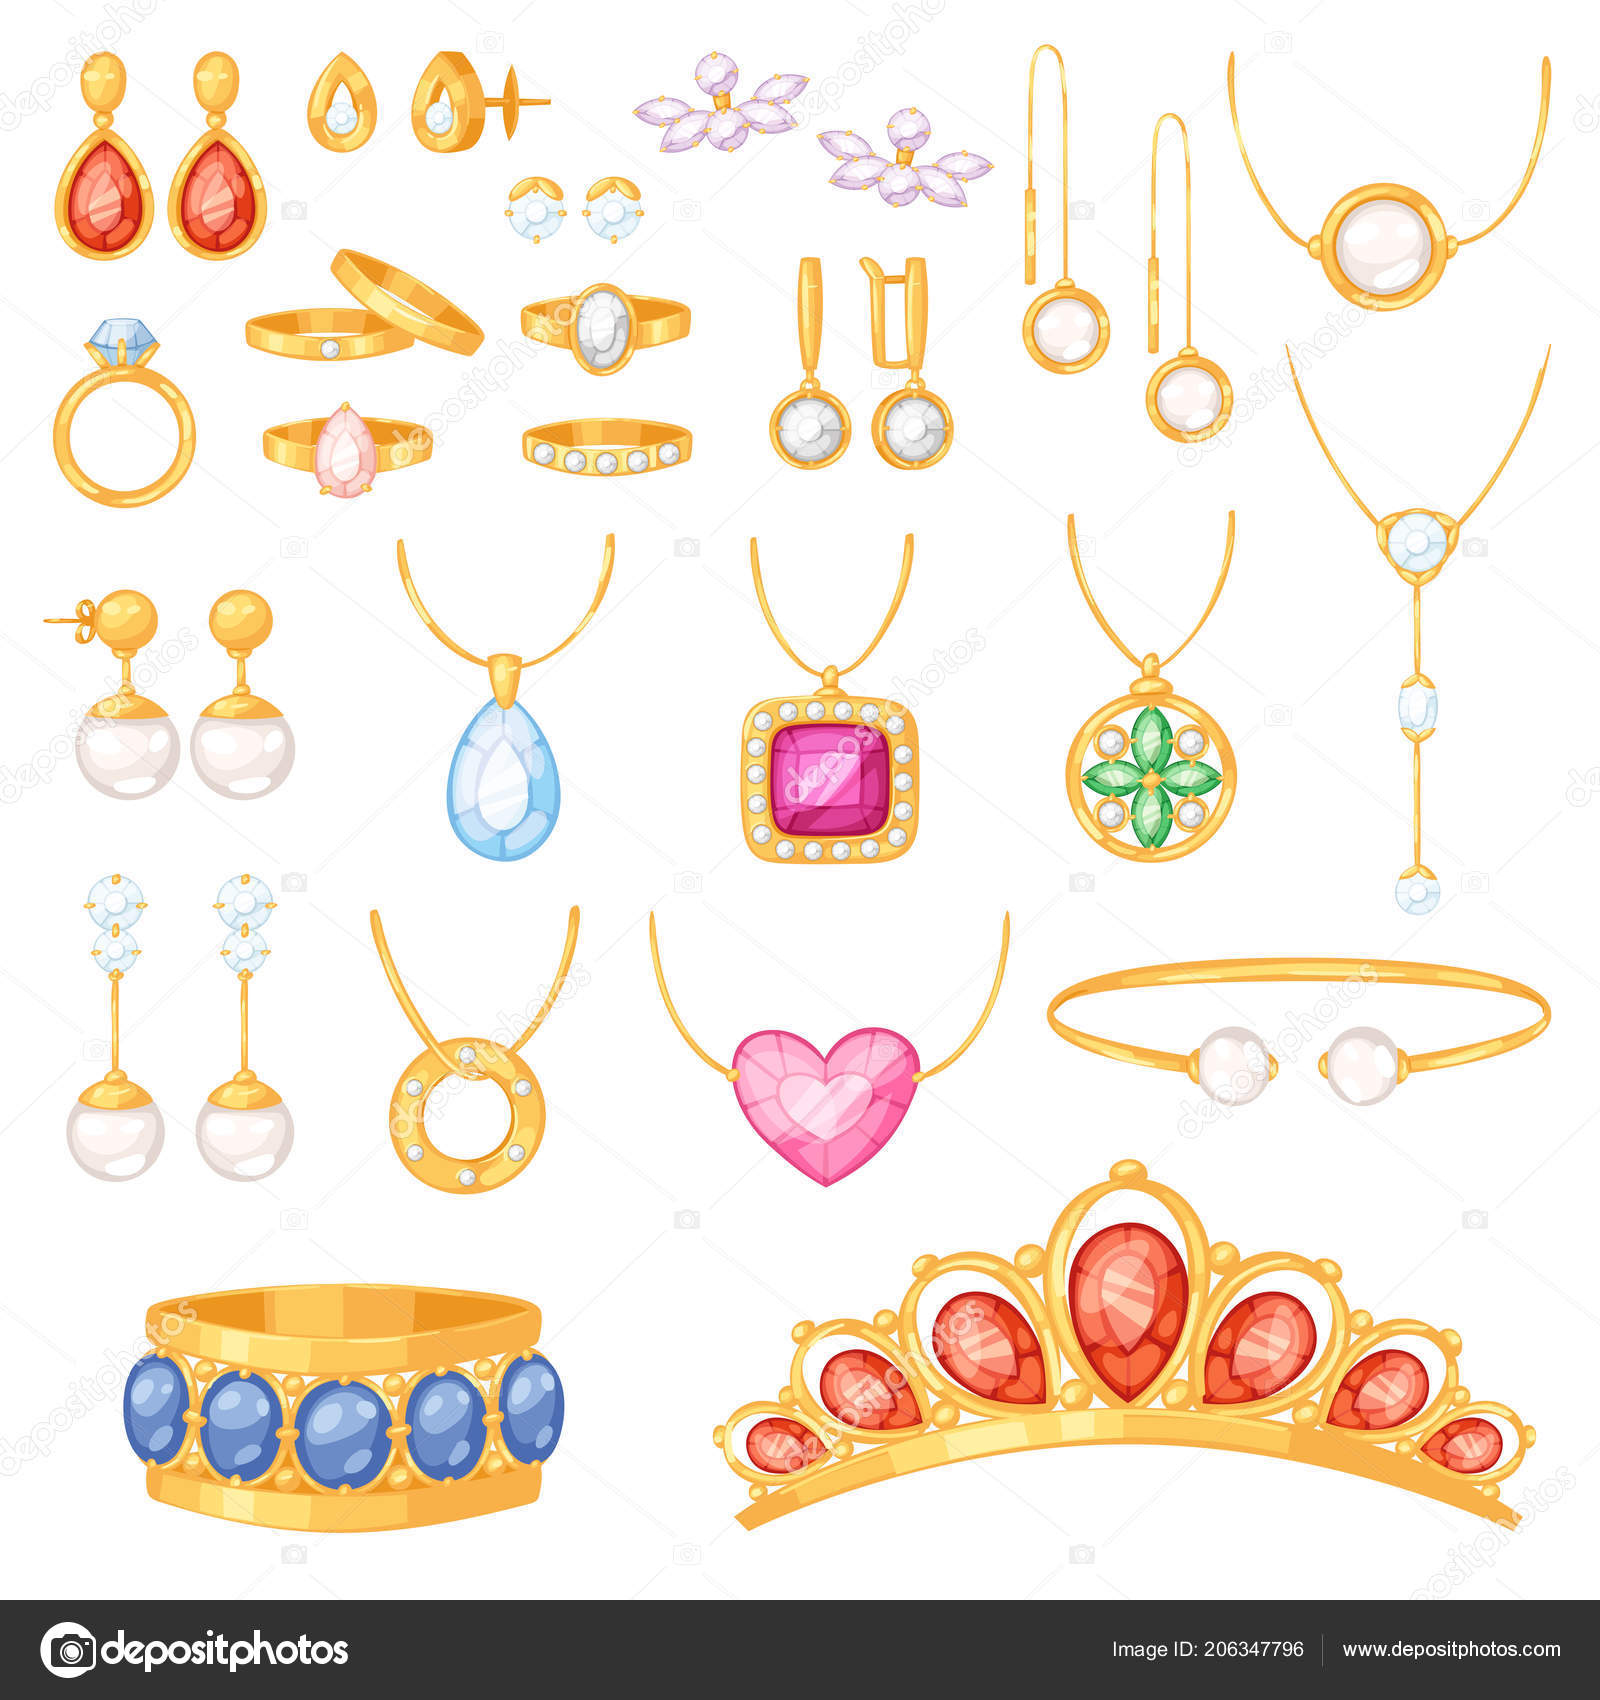 b944c72e70e8 Joyas vector joyería oro pulsera collar aretes y anillos de plata con  diamantes conjunto ilustración de accesorios joya de mujer aislado sobre  fondo blanco ...